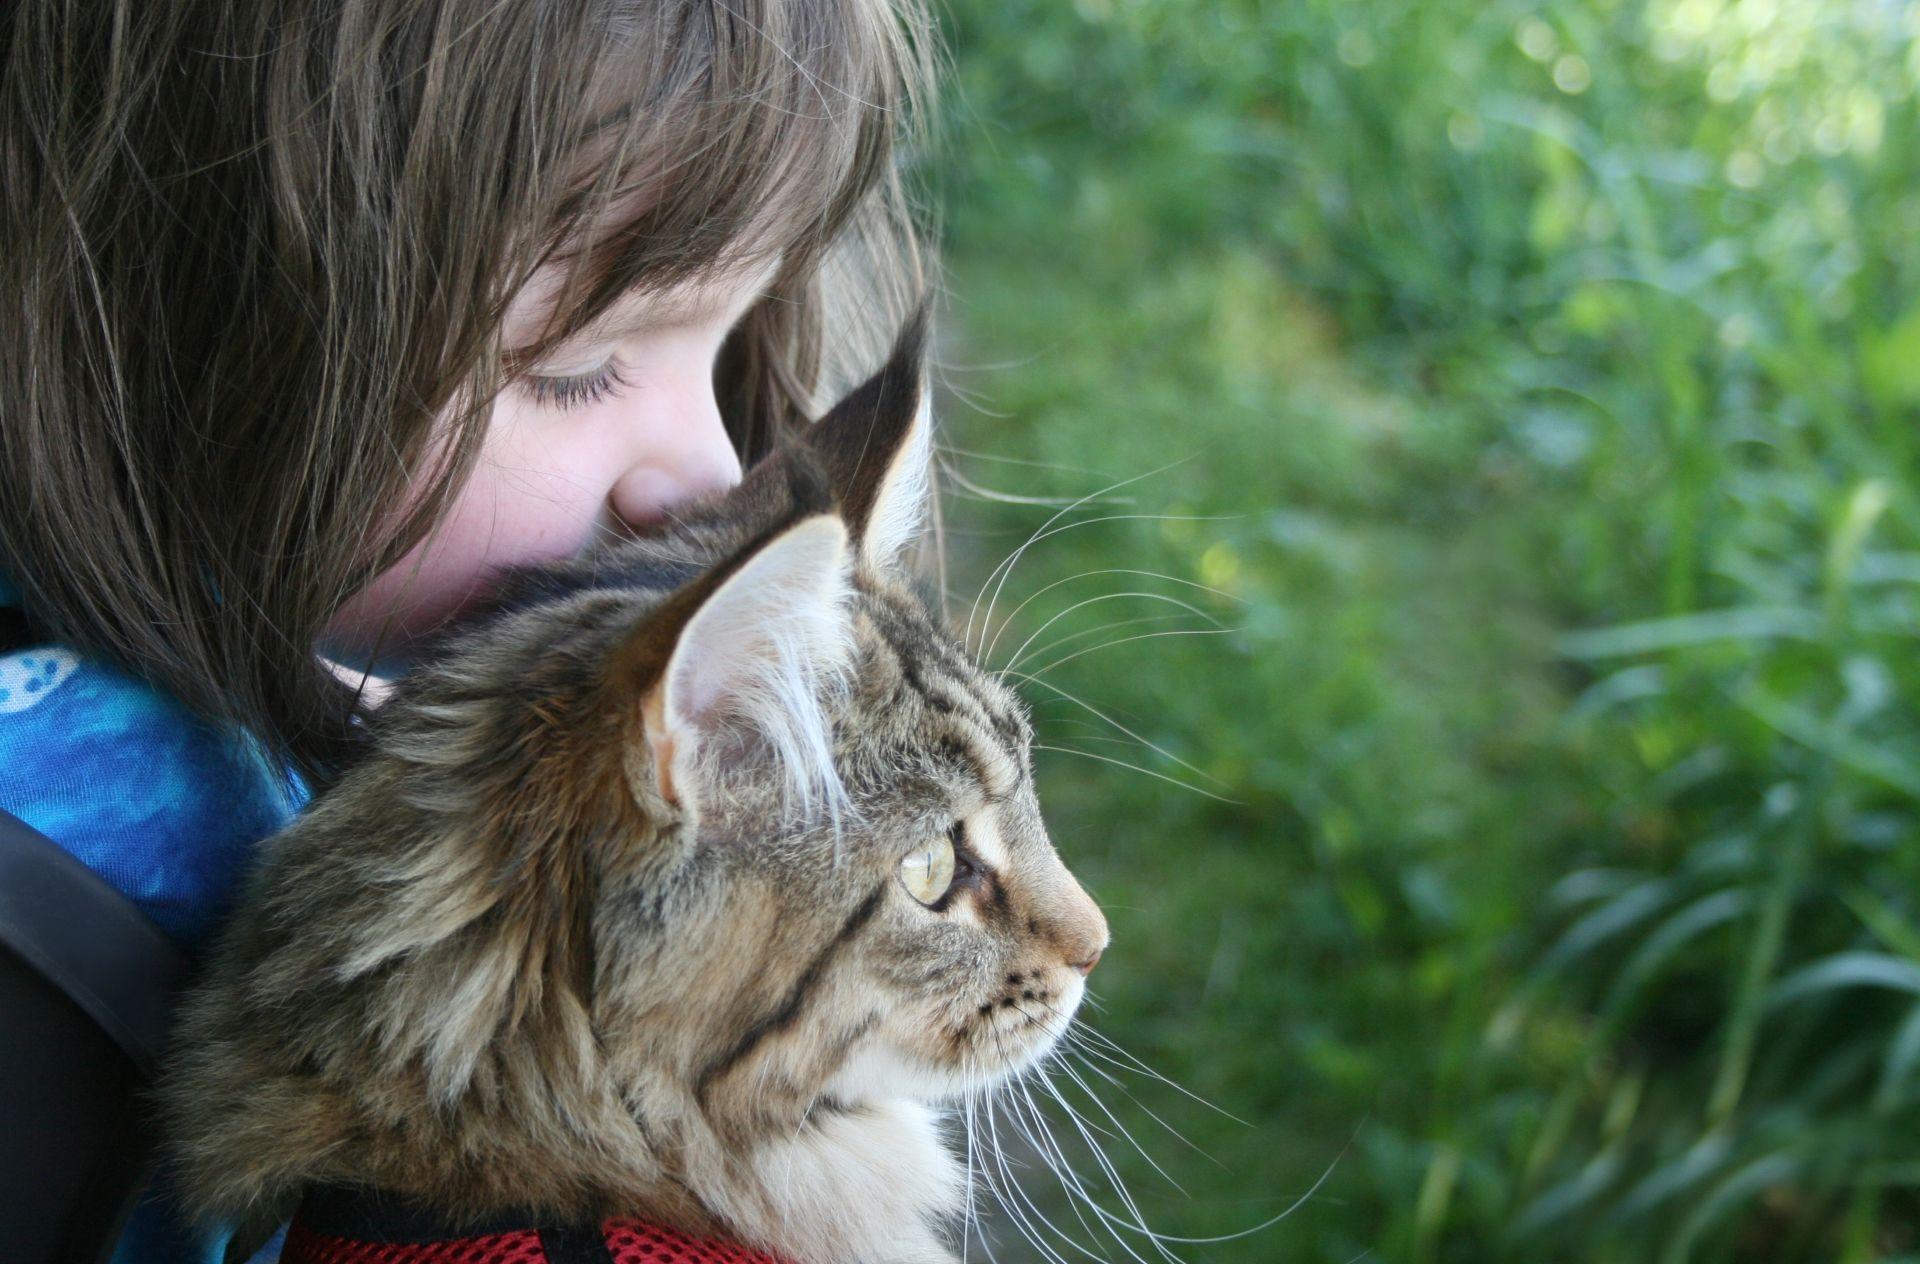 Не кошки «помогают от аутизма», а внимание и забота родителей